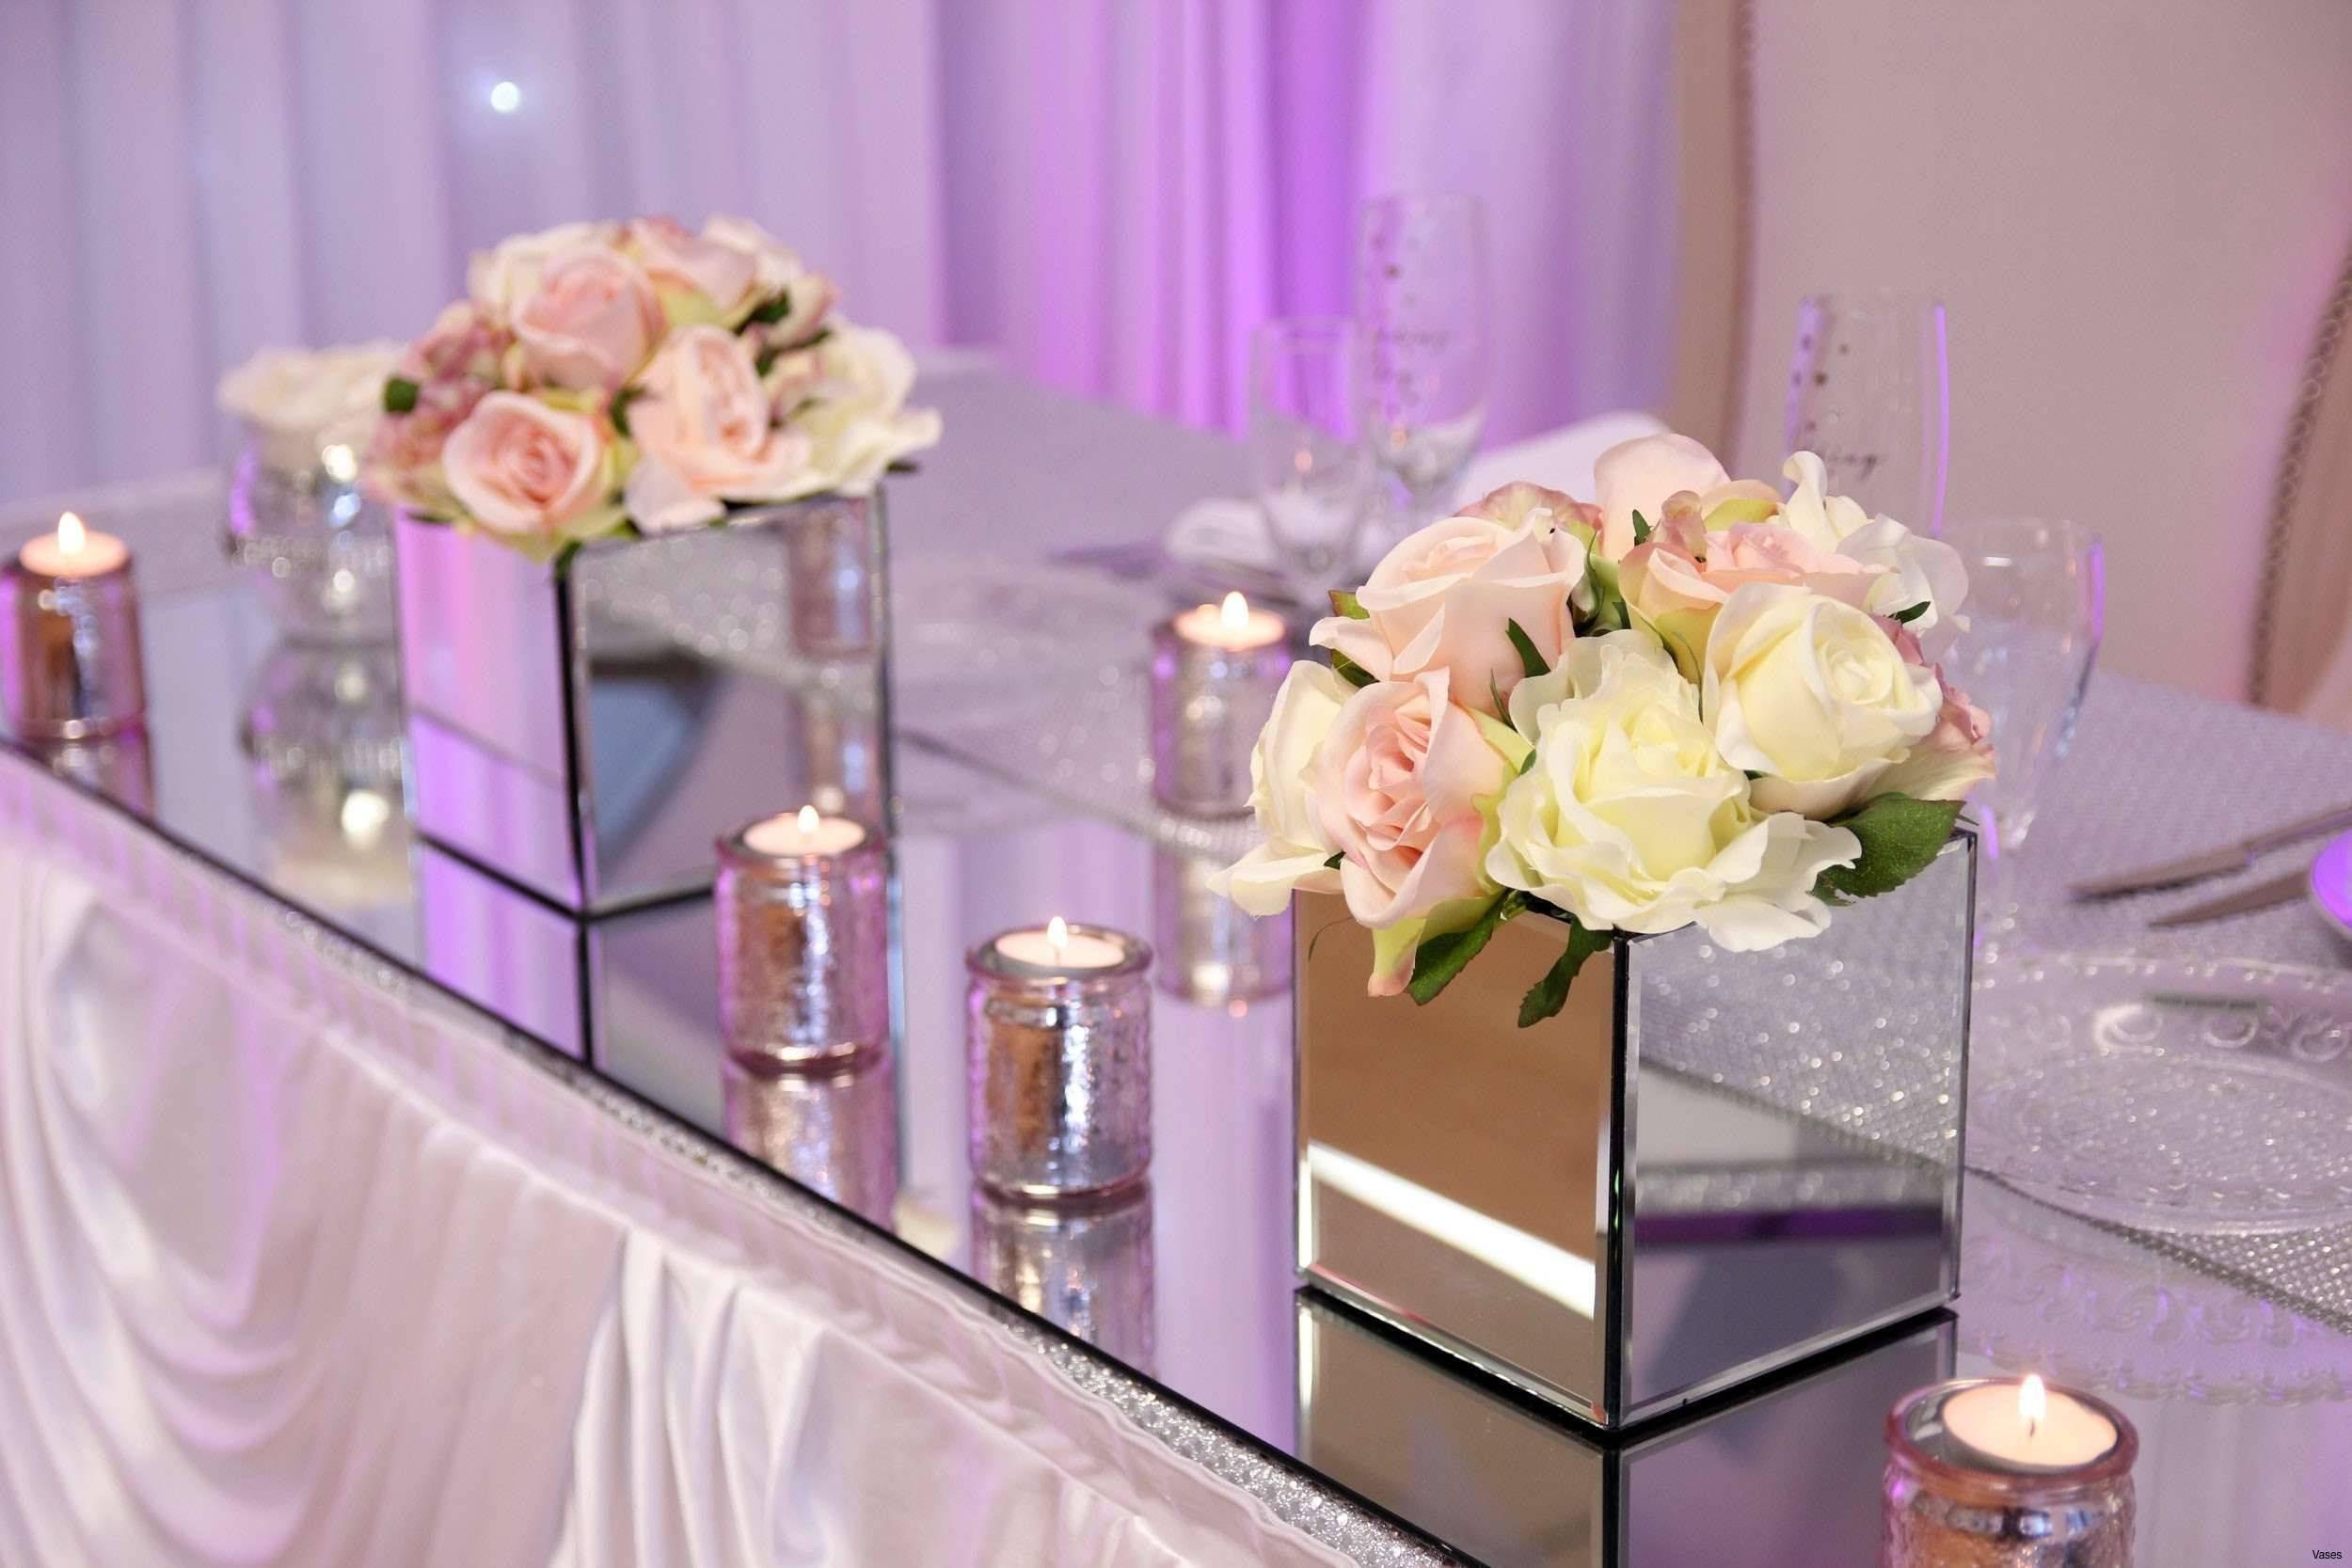 diy vase ideas of diy wedding decor ideas awesome mirrored square vase 3h vases mirror inside diy wedding decor ideas awesome mirrored square vase 3h vases mirror table decorationi 0d weddings of